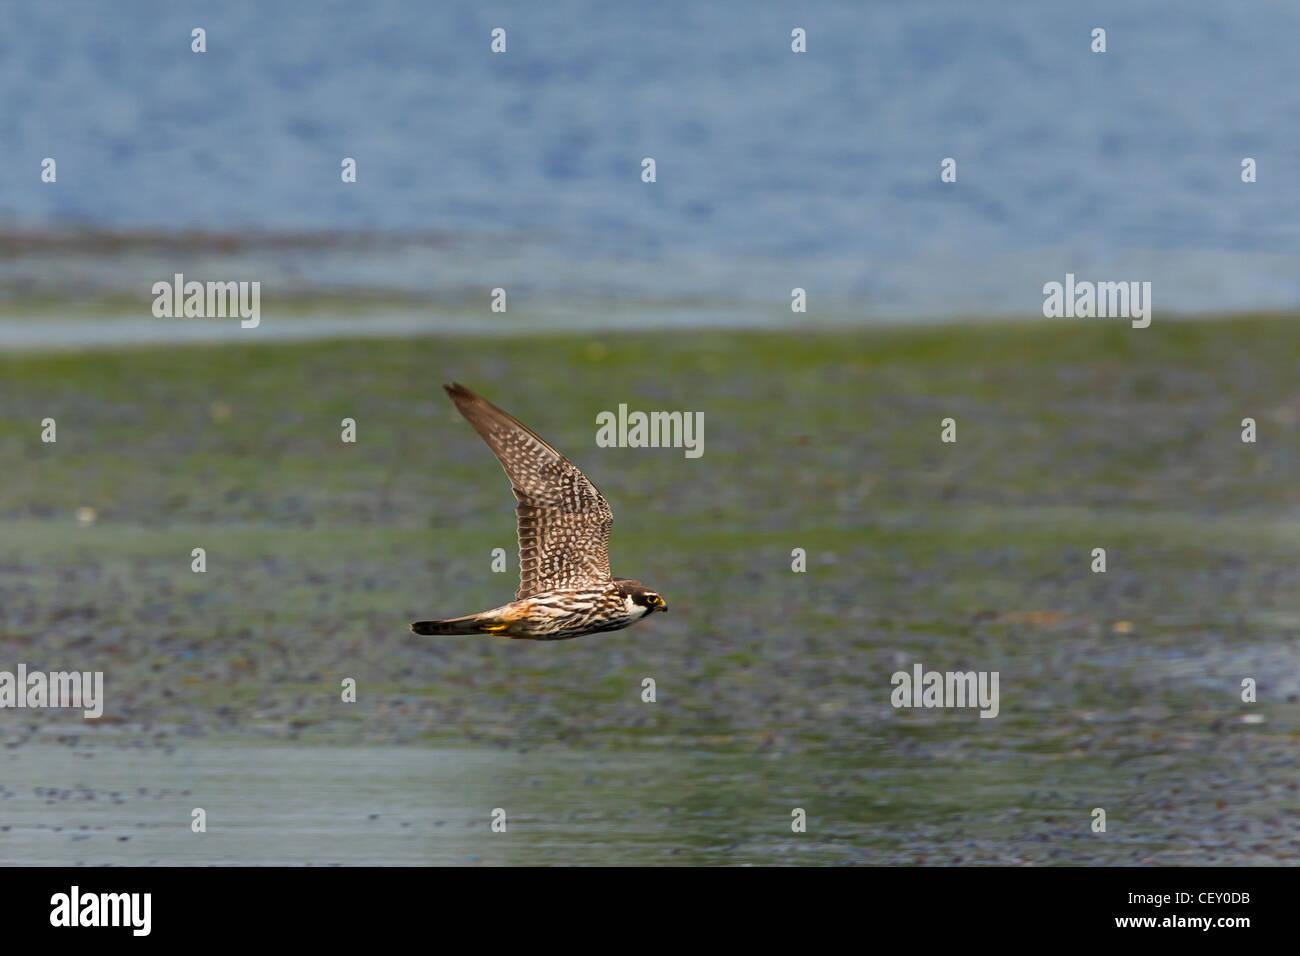 Hobby euroasiático (Falco Subbuteo) persiguiendo libélulas encima del lago, Alemania Imagen De Stock